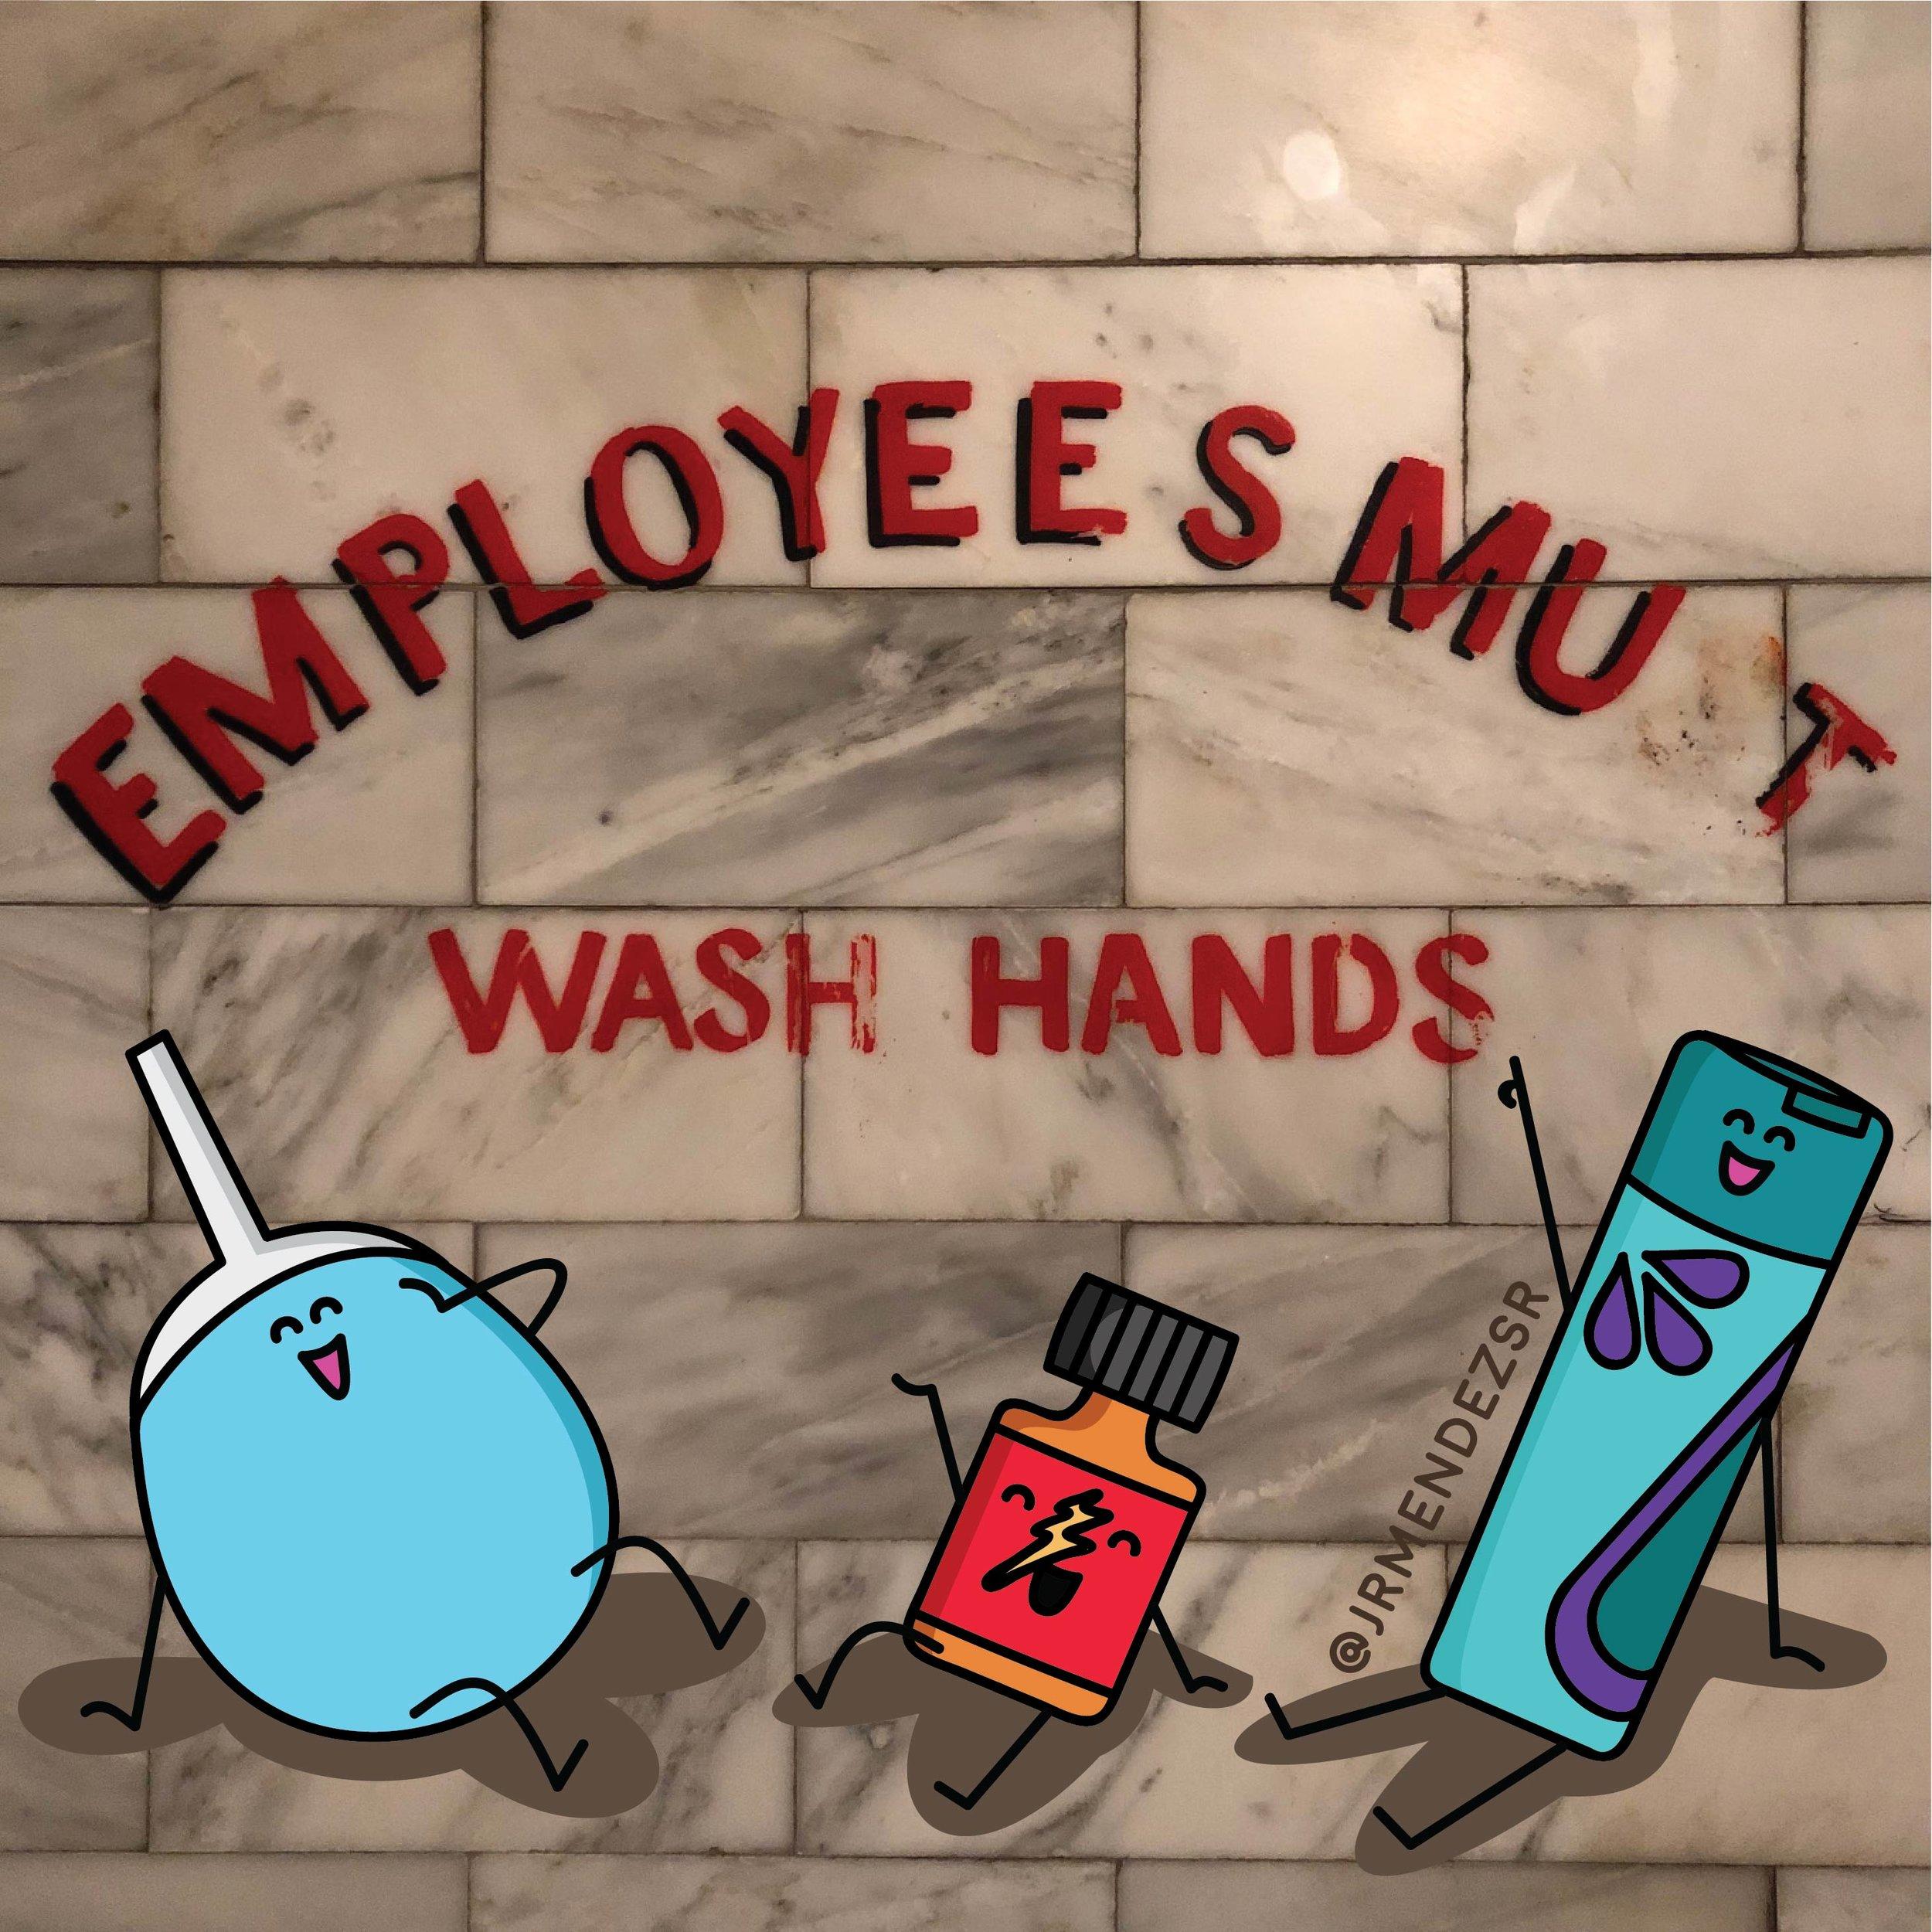 Employee Smut